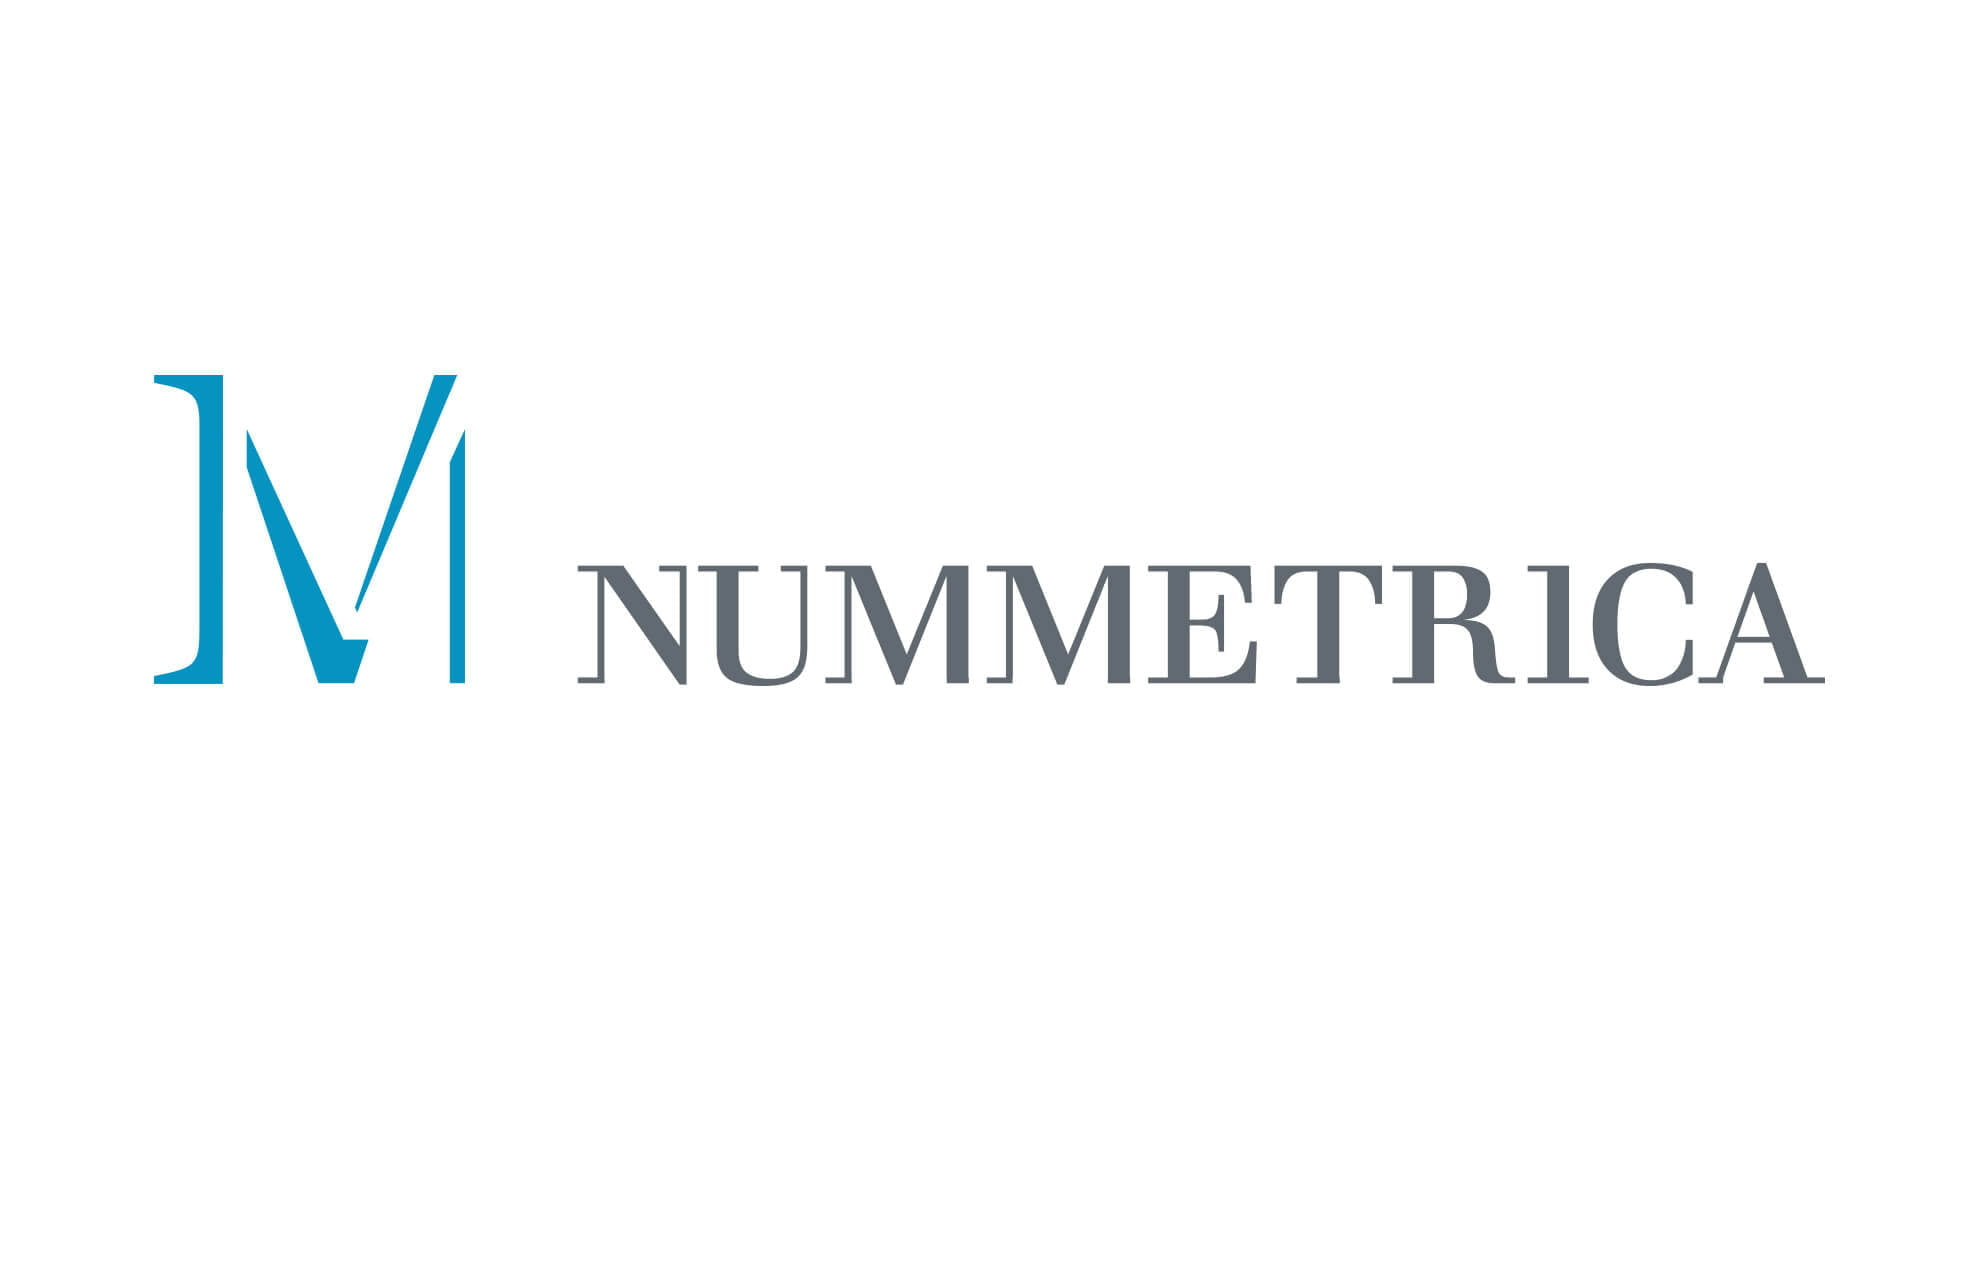 nummetrica design logo1 - Diseño de identidad gráfica